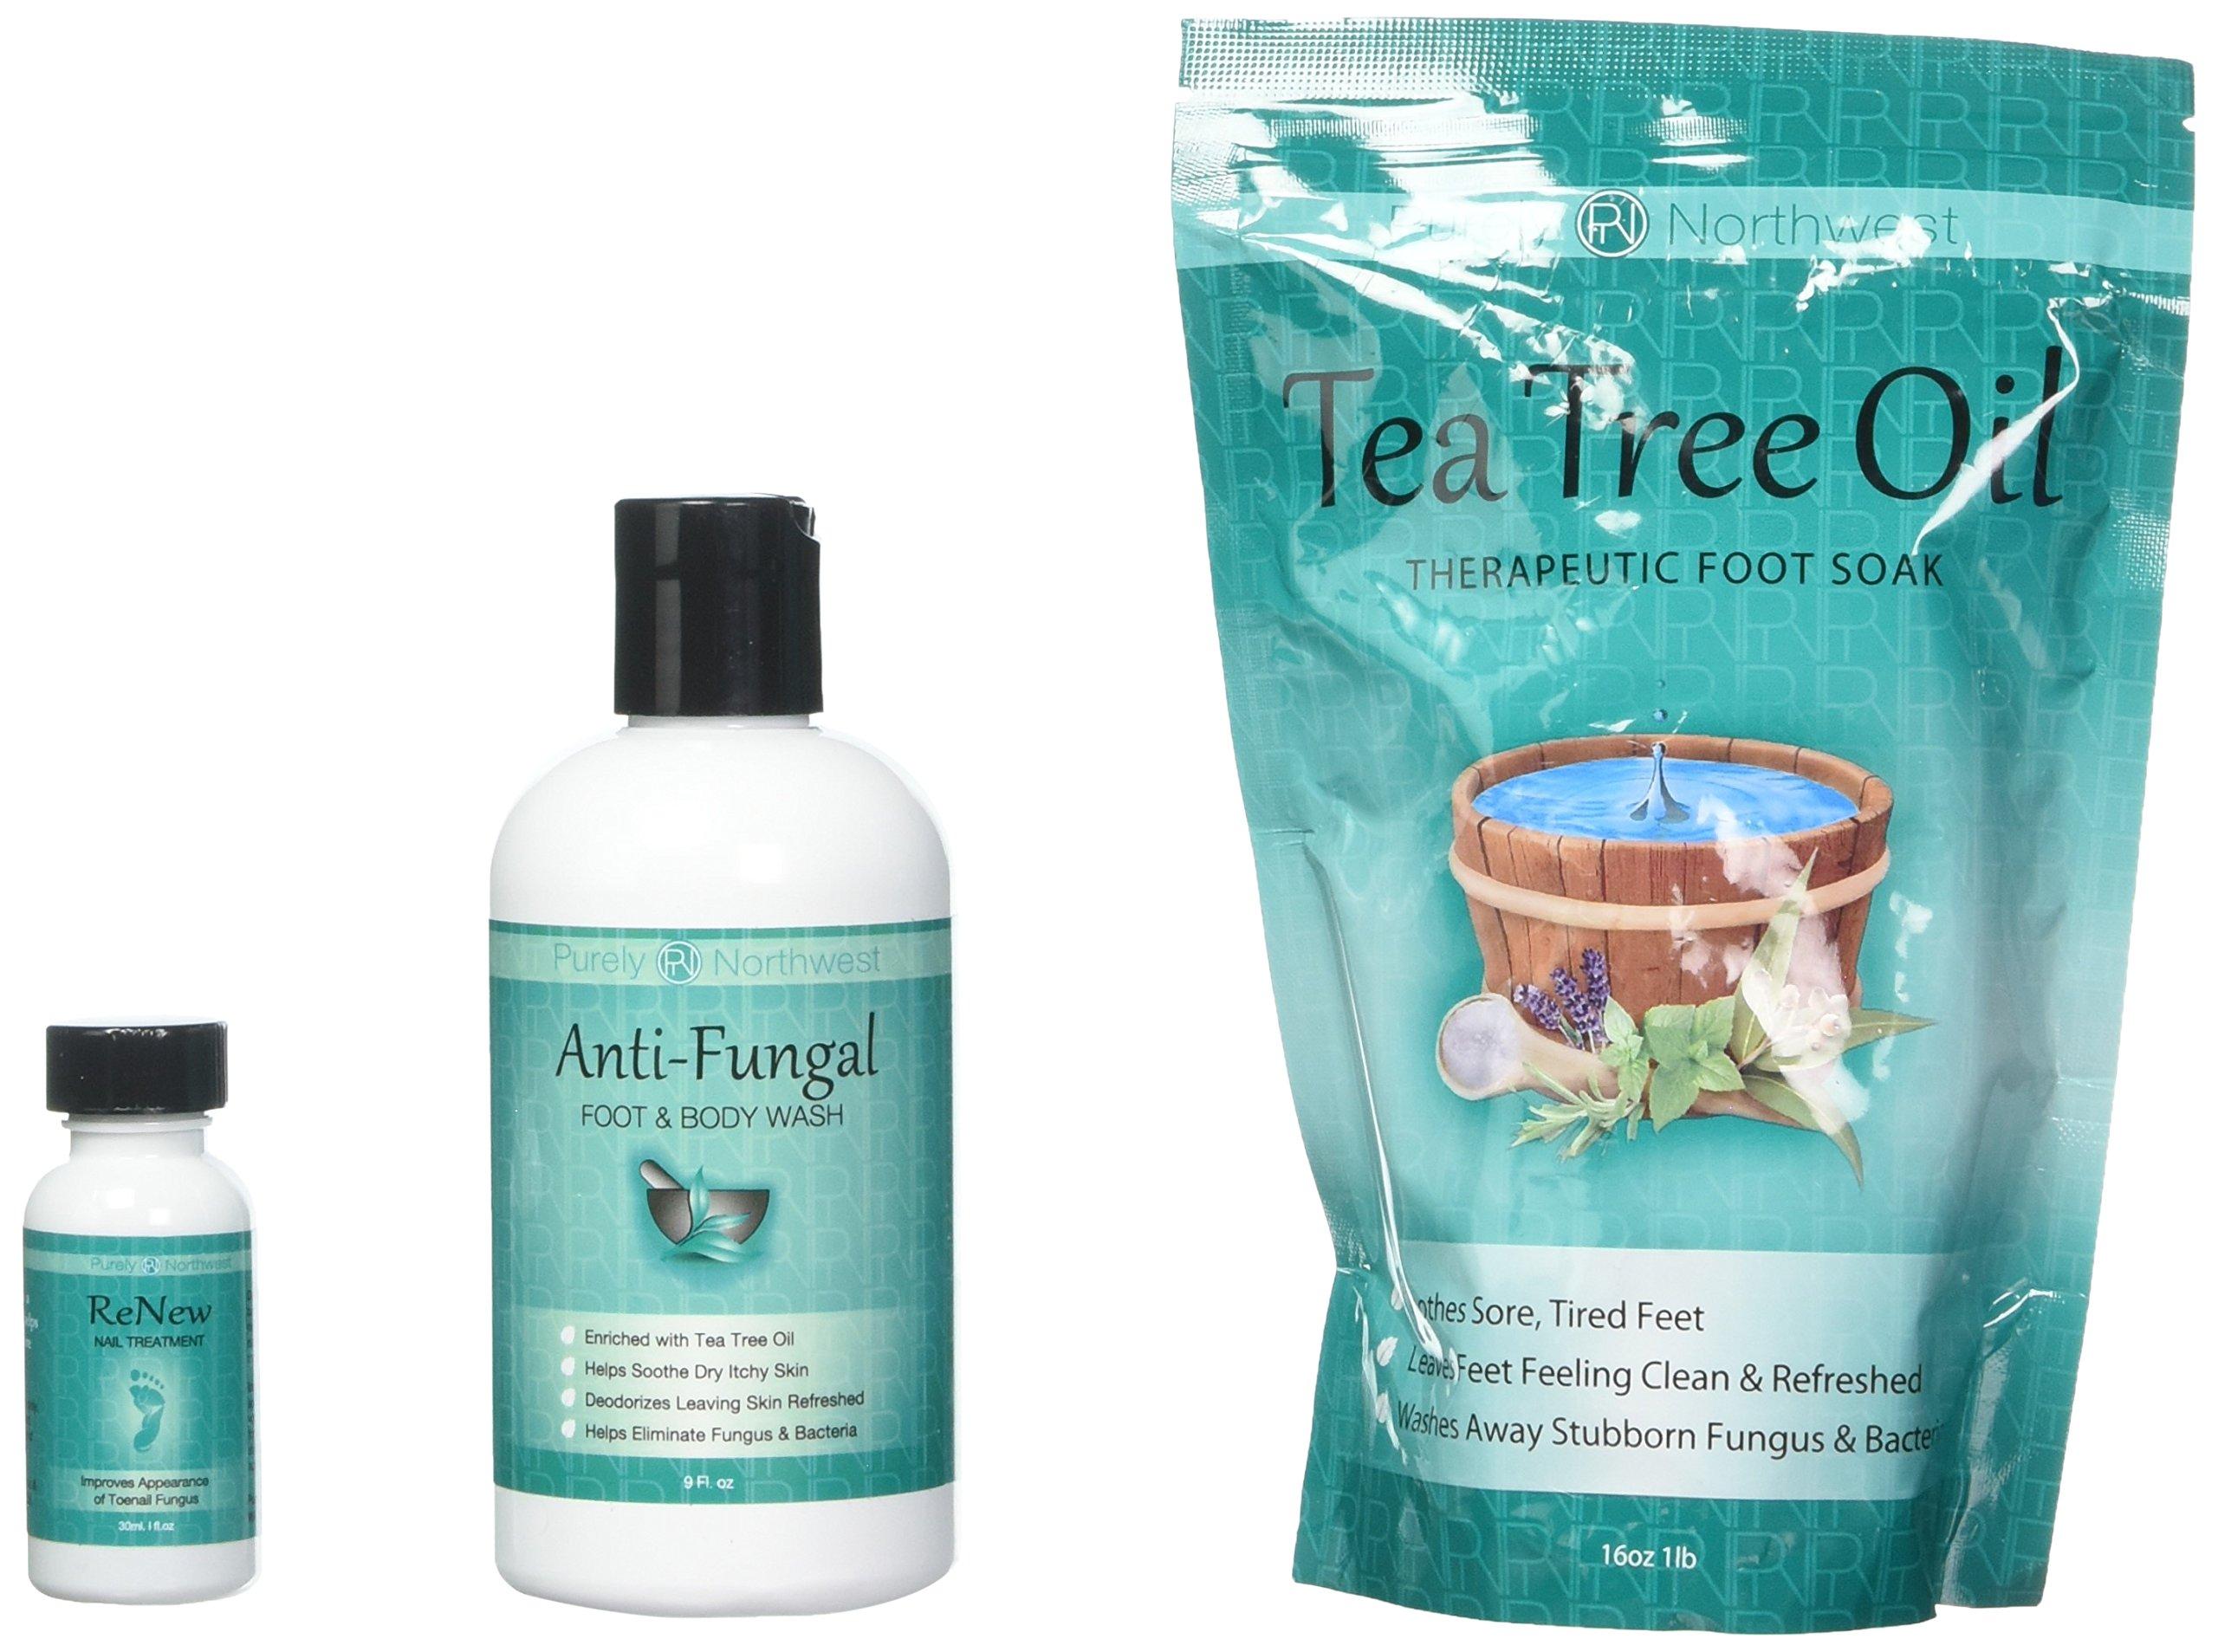 Purely Northwest Foot and Toenail System with 16 oz Tea Tree Oil Foot Soak, 9 fl oz Antifungal Wash and 1 fl oz ReNew Nail Solution